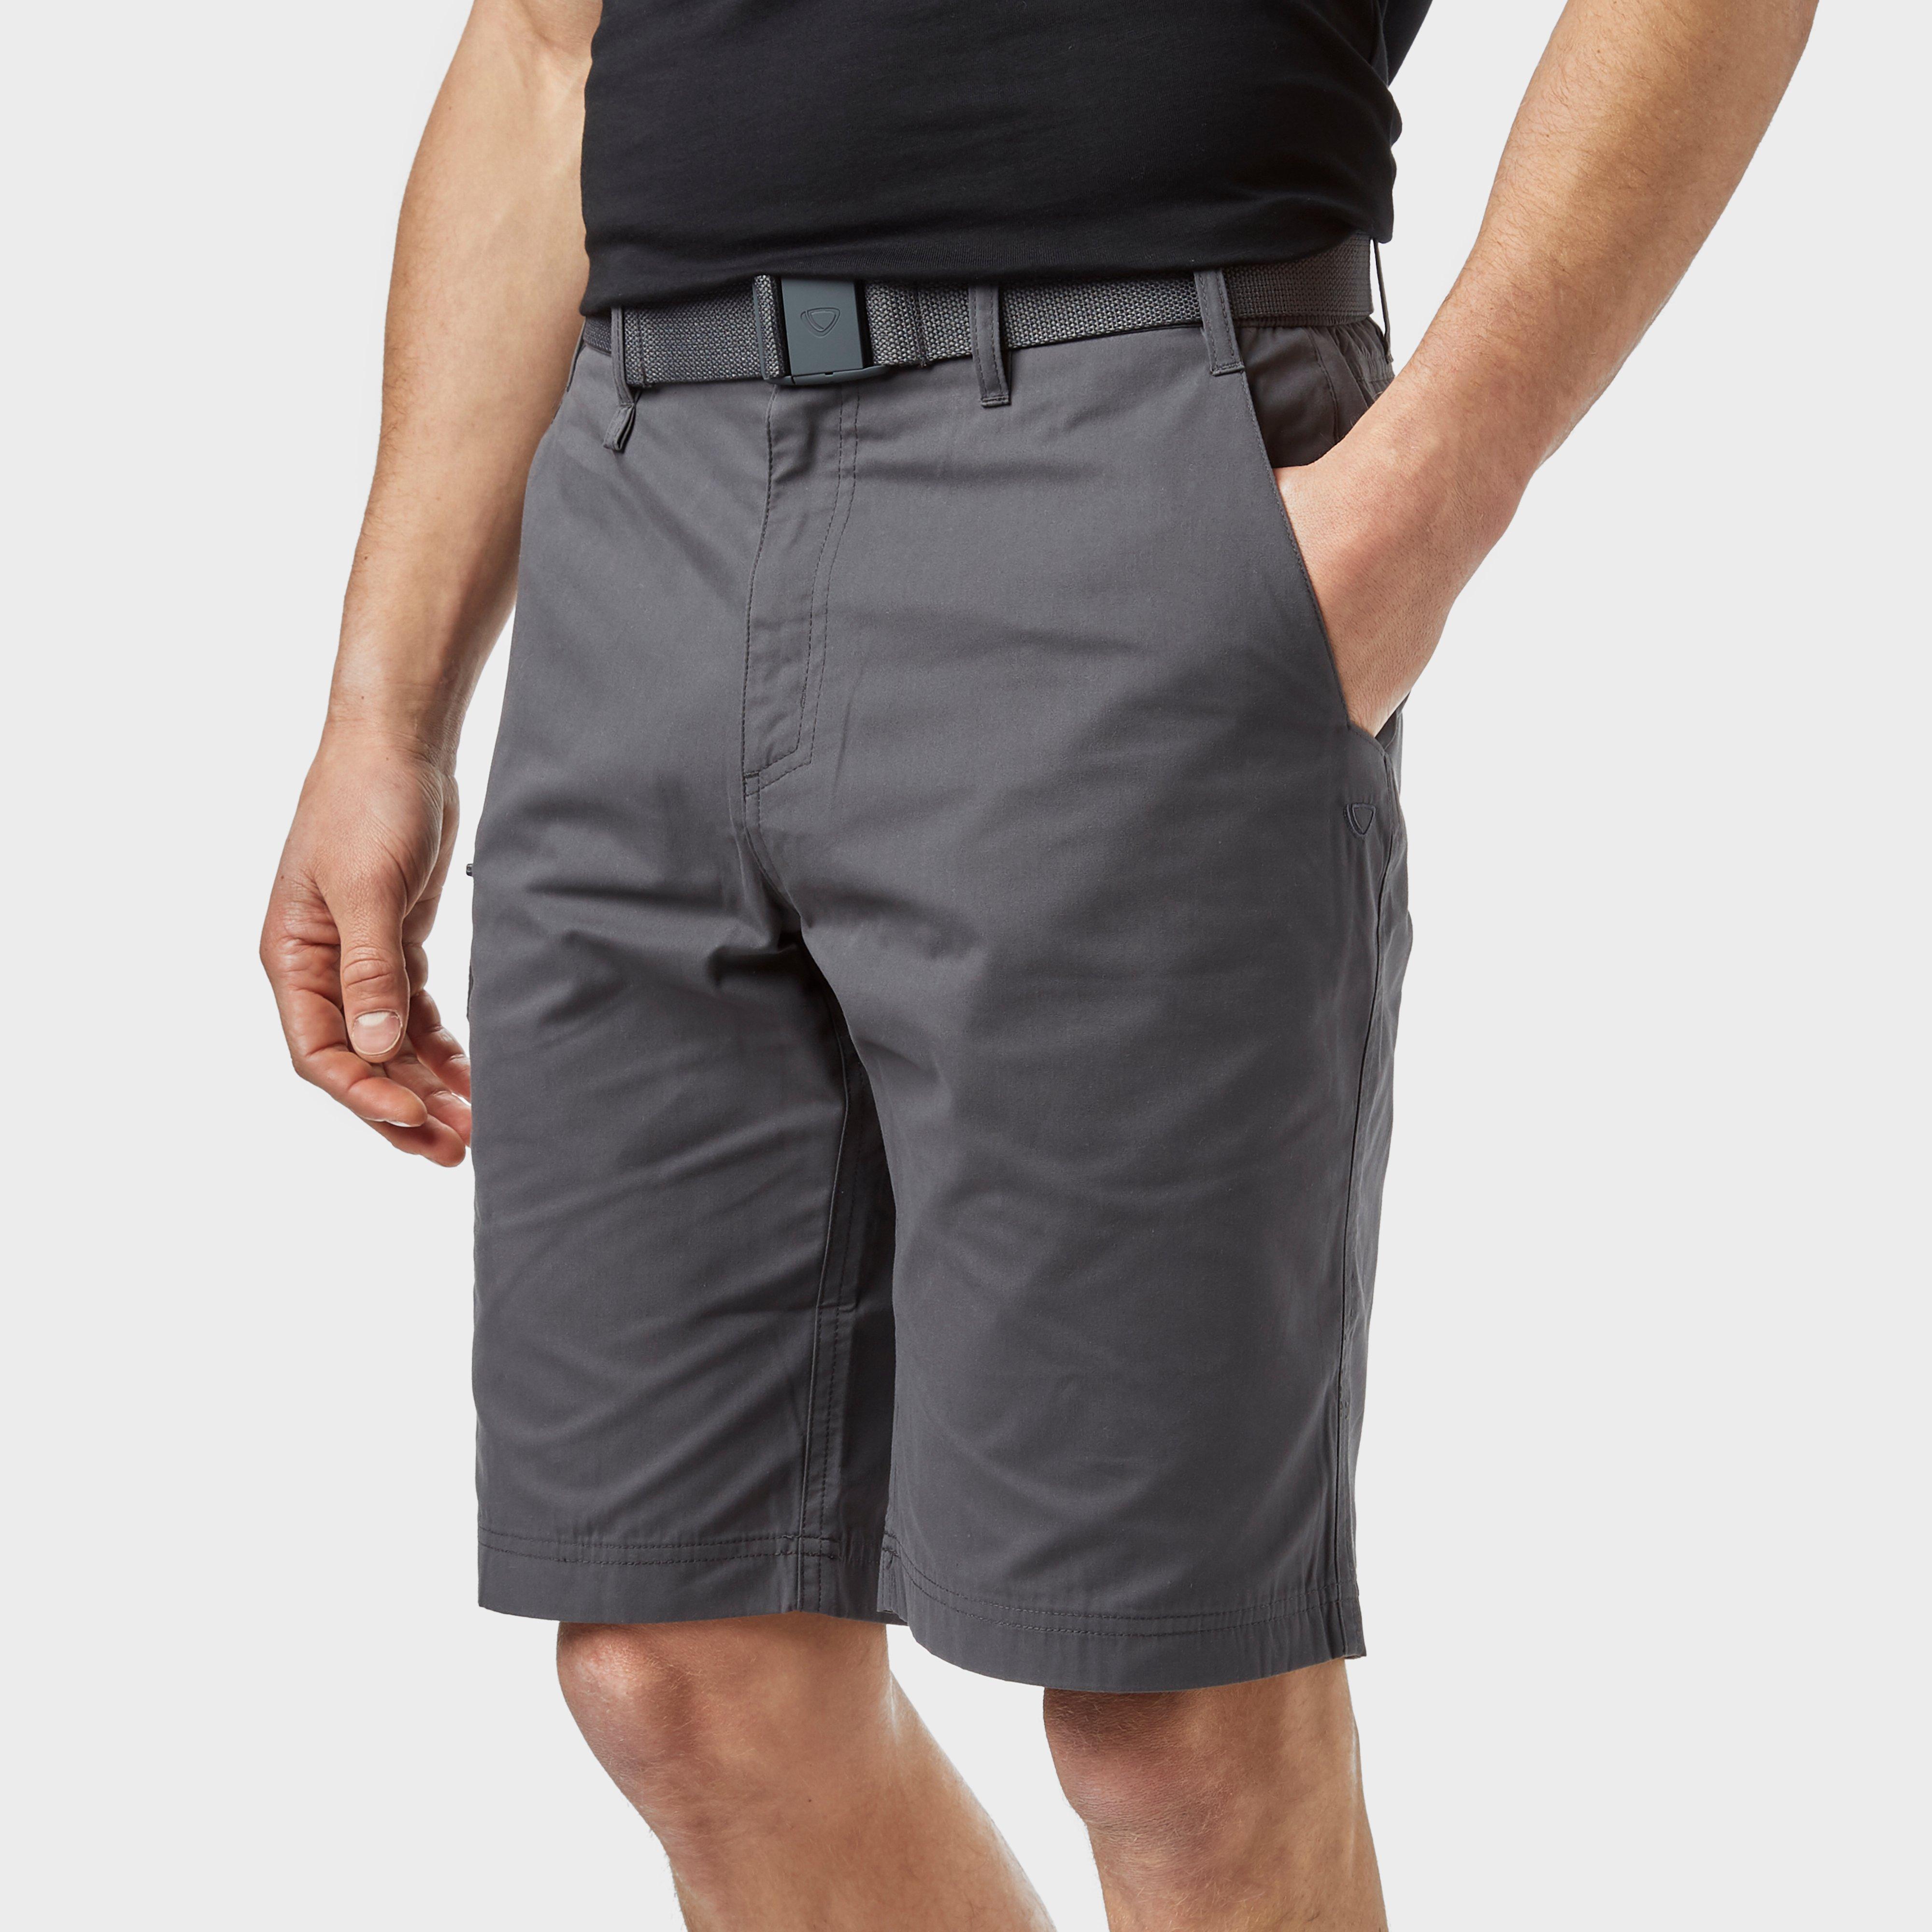 Brasher Mens Shorts - Grey/grey  Grey/grey